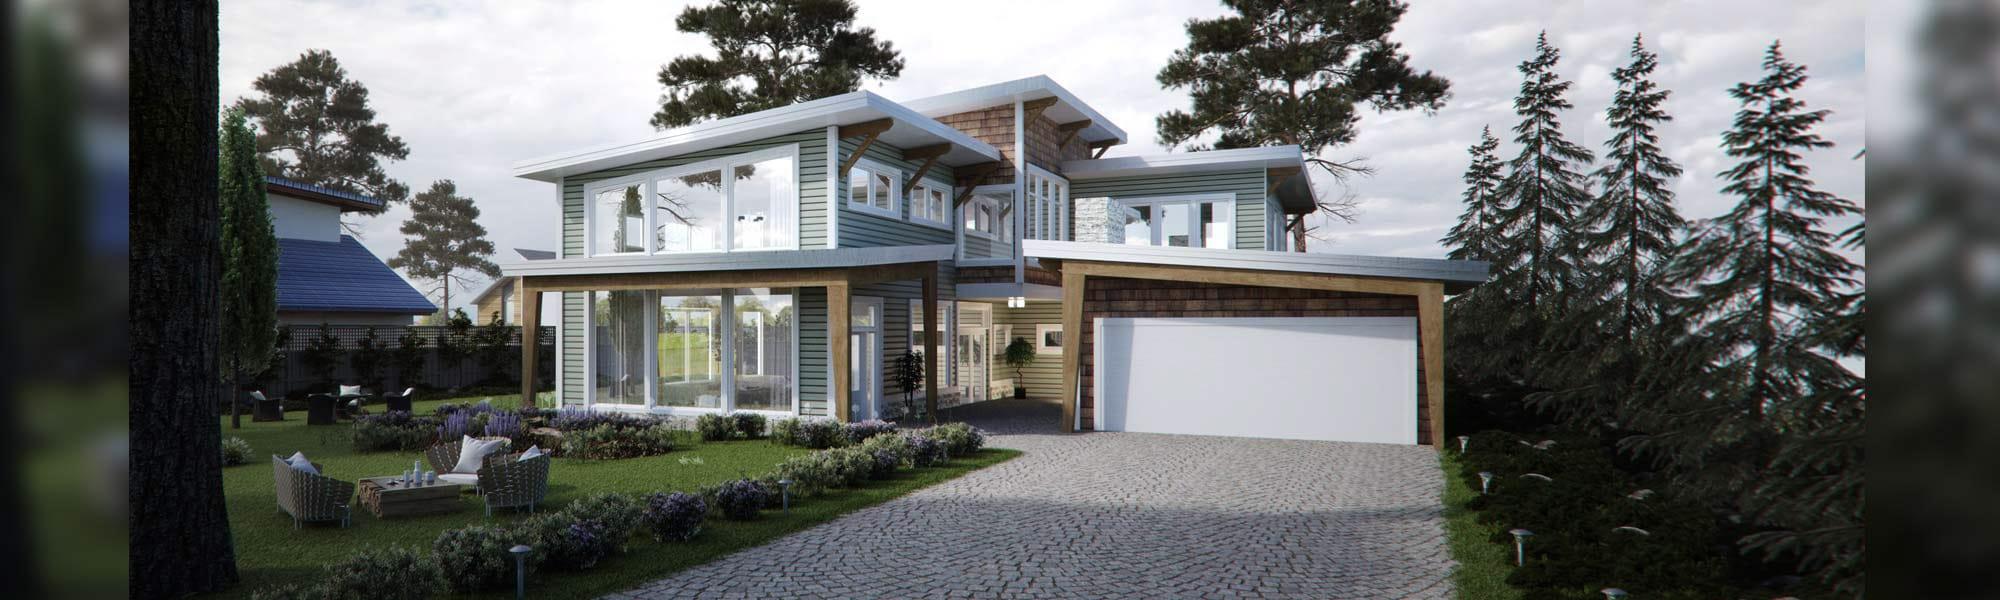 Tacoma craftsman timber frame floor plan